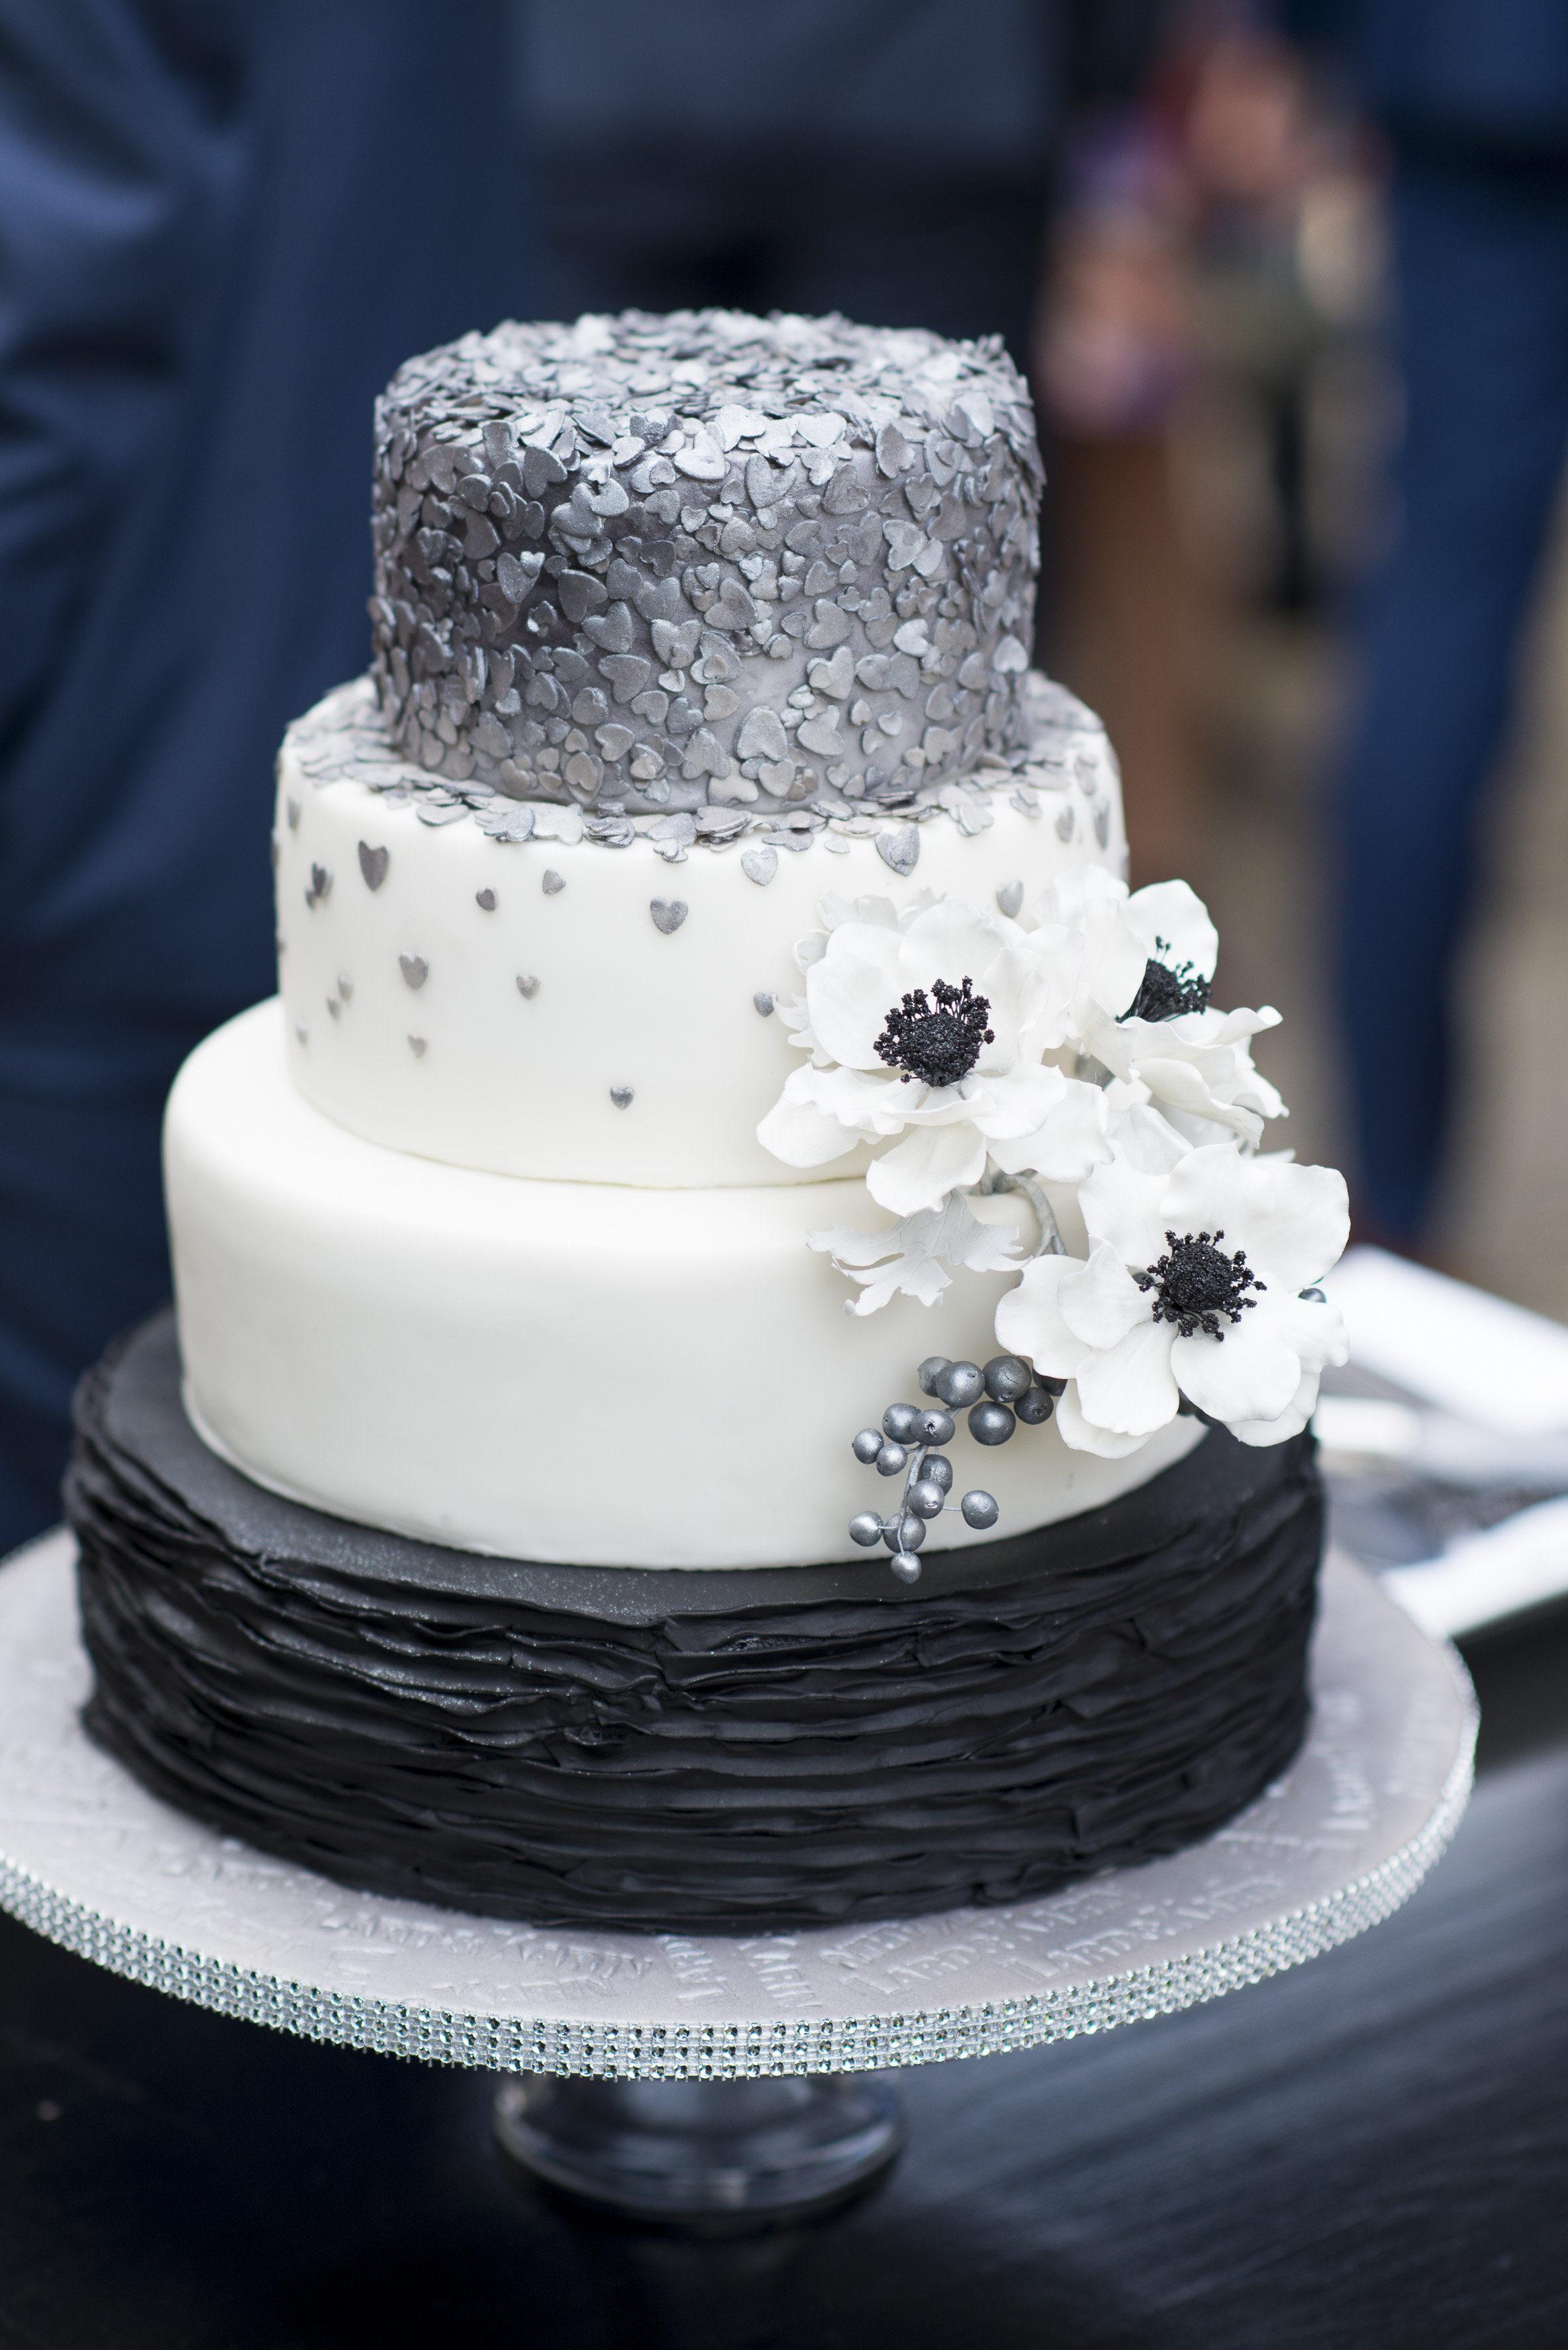 View More: http://blikenbloosfotografie.pass.us/2017-09-01-bruiloft-lard-karin